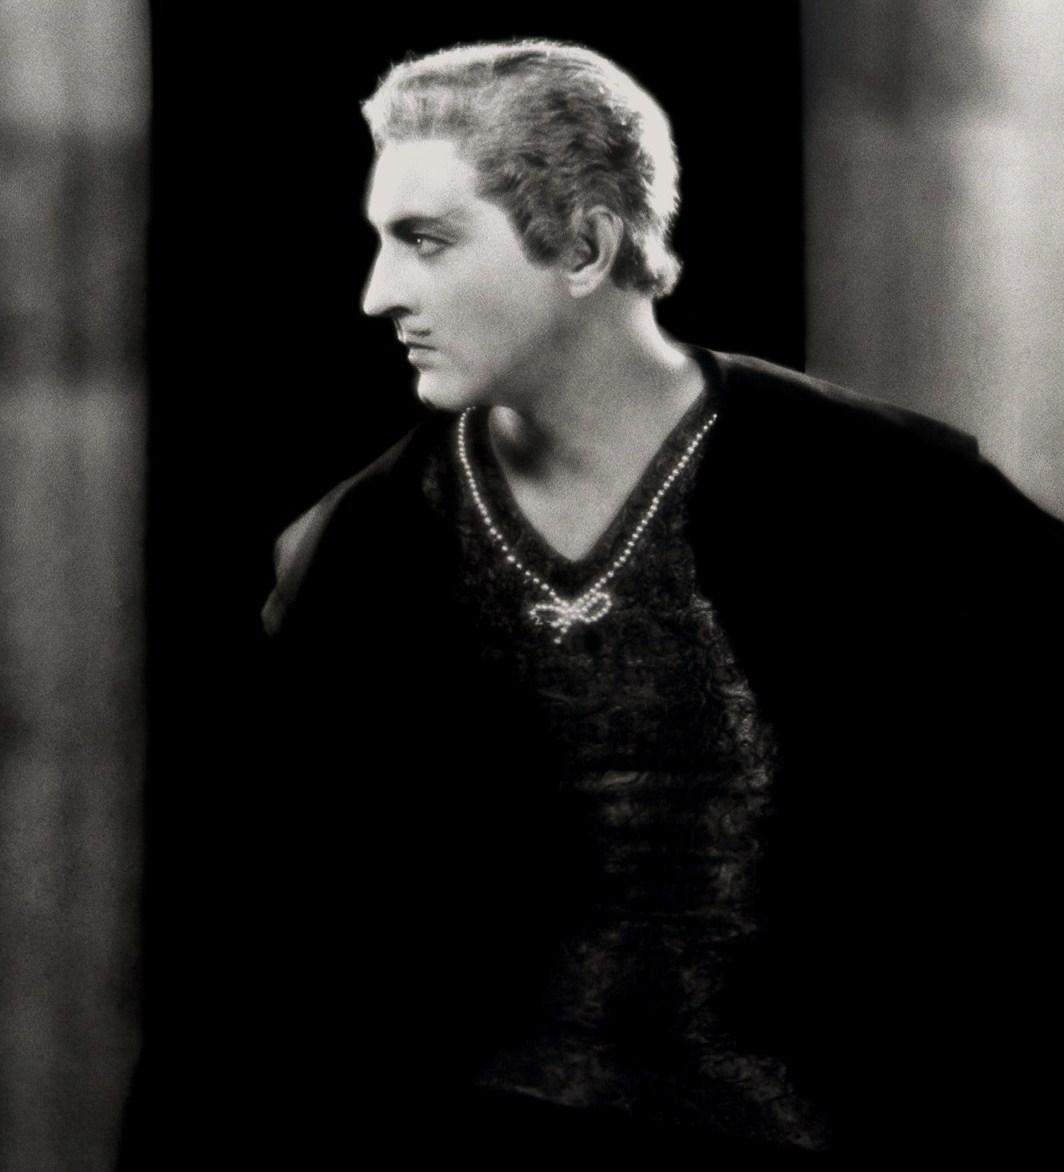 John Barrymore surely had a very back [u] sound